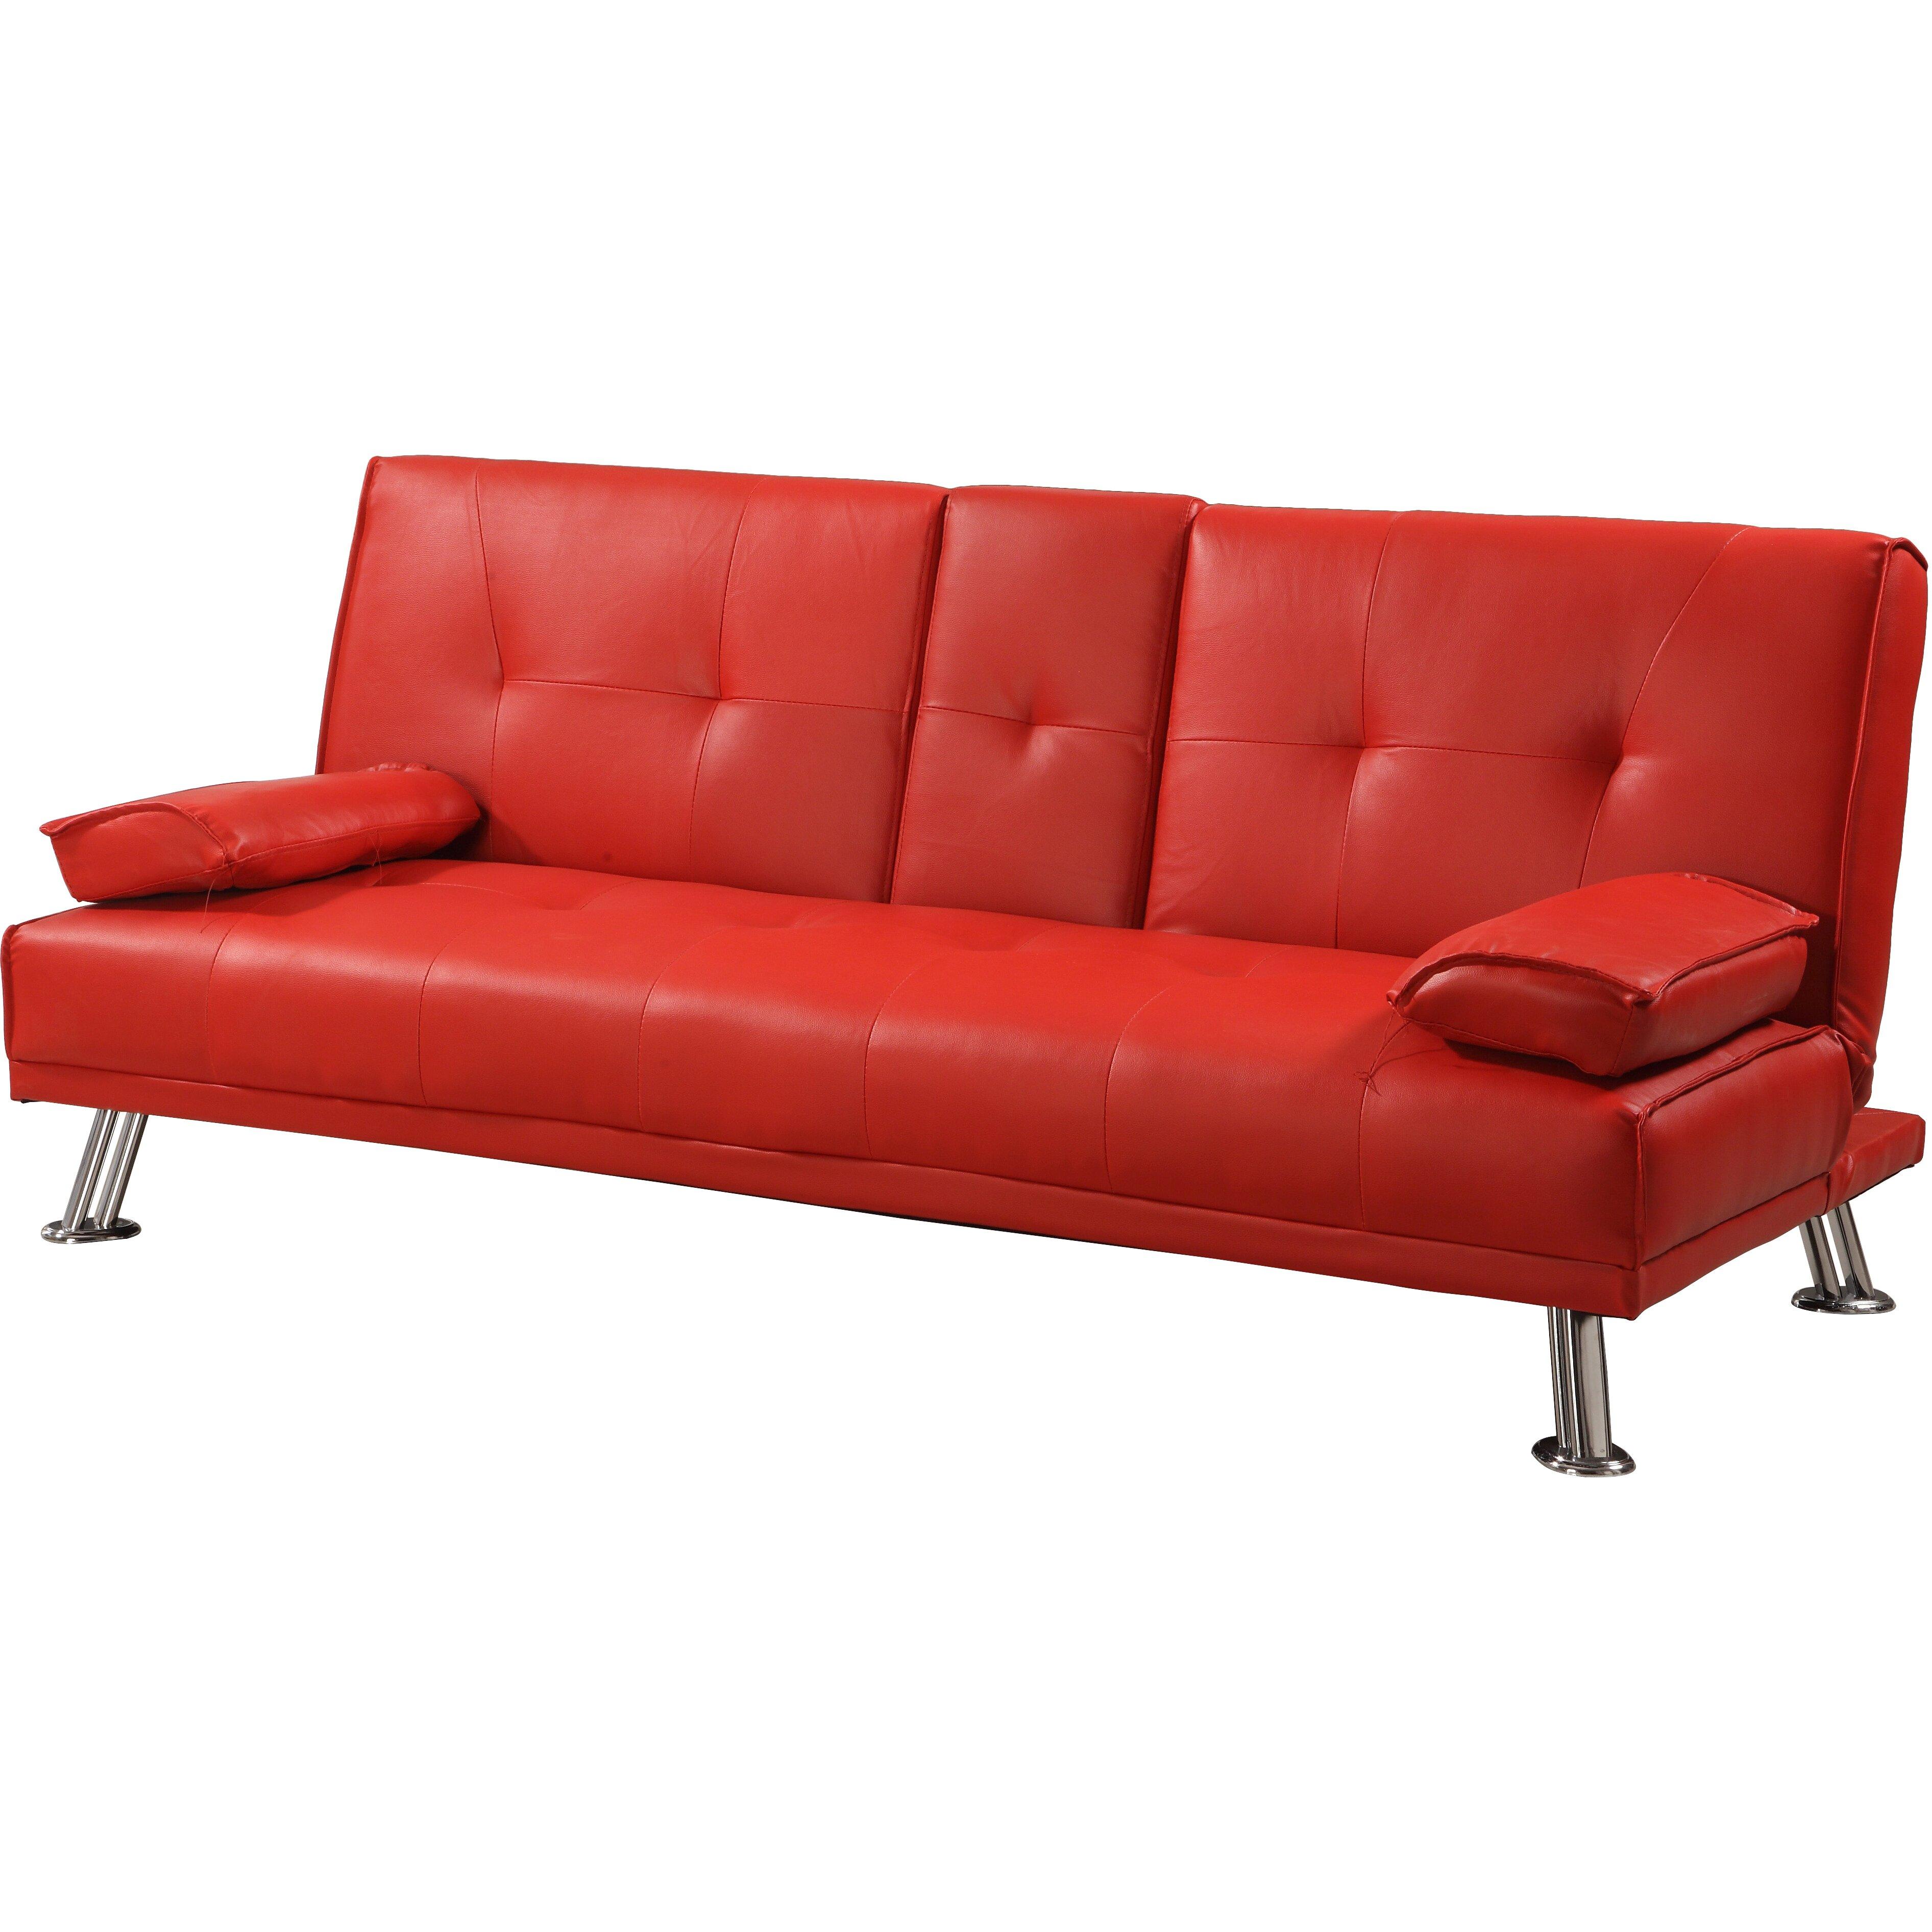 3 seater clic clac sofa wayfair uk - Divan clic clac ikea ...